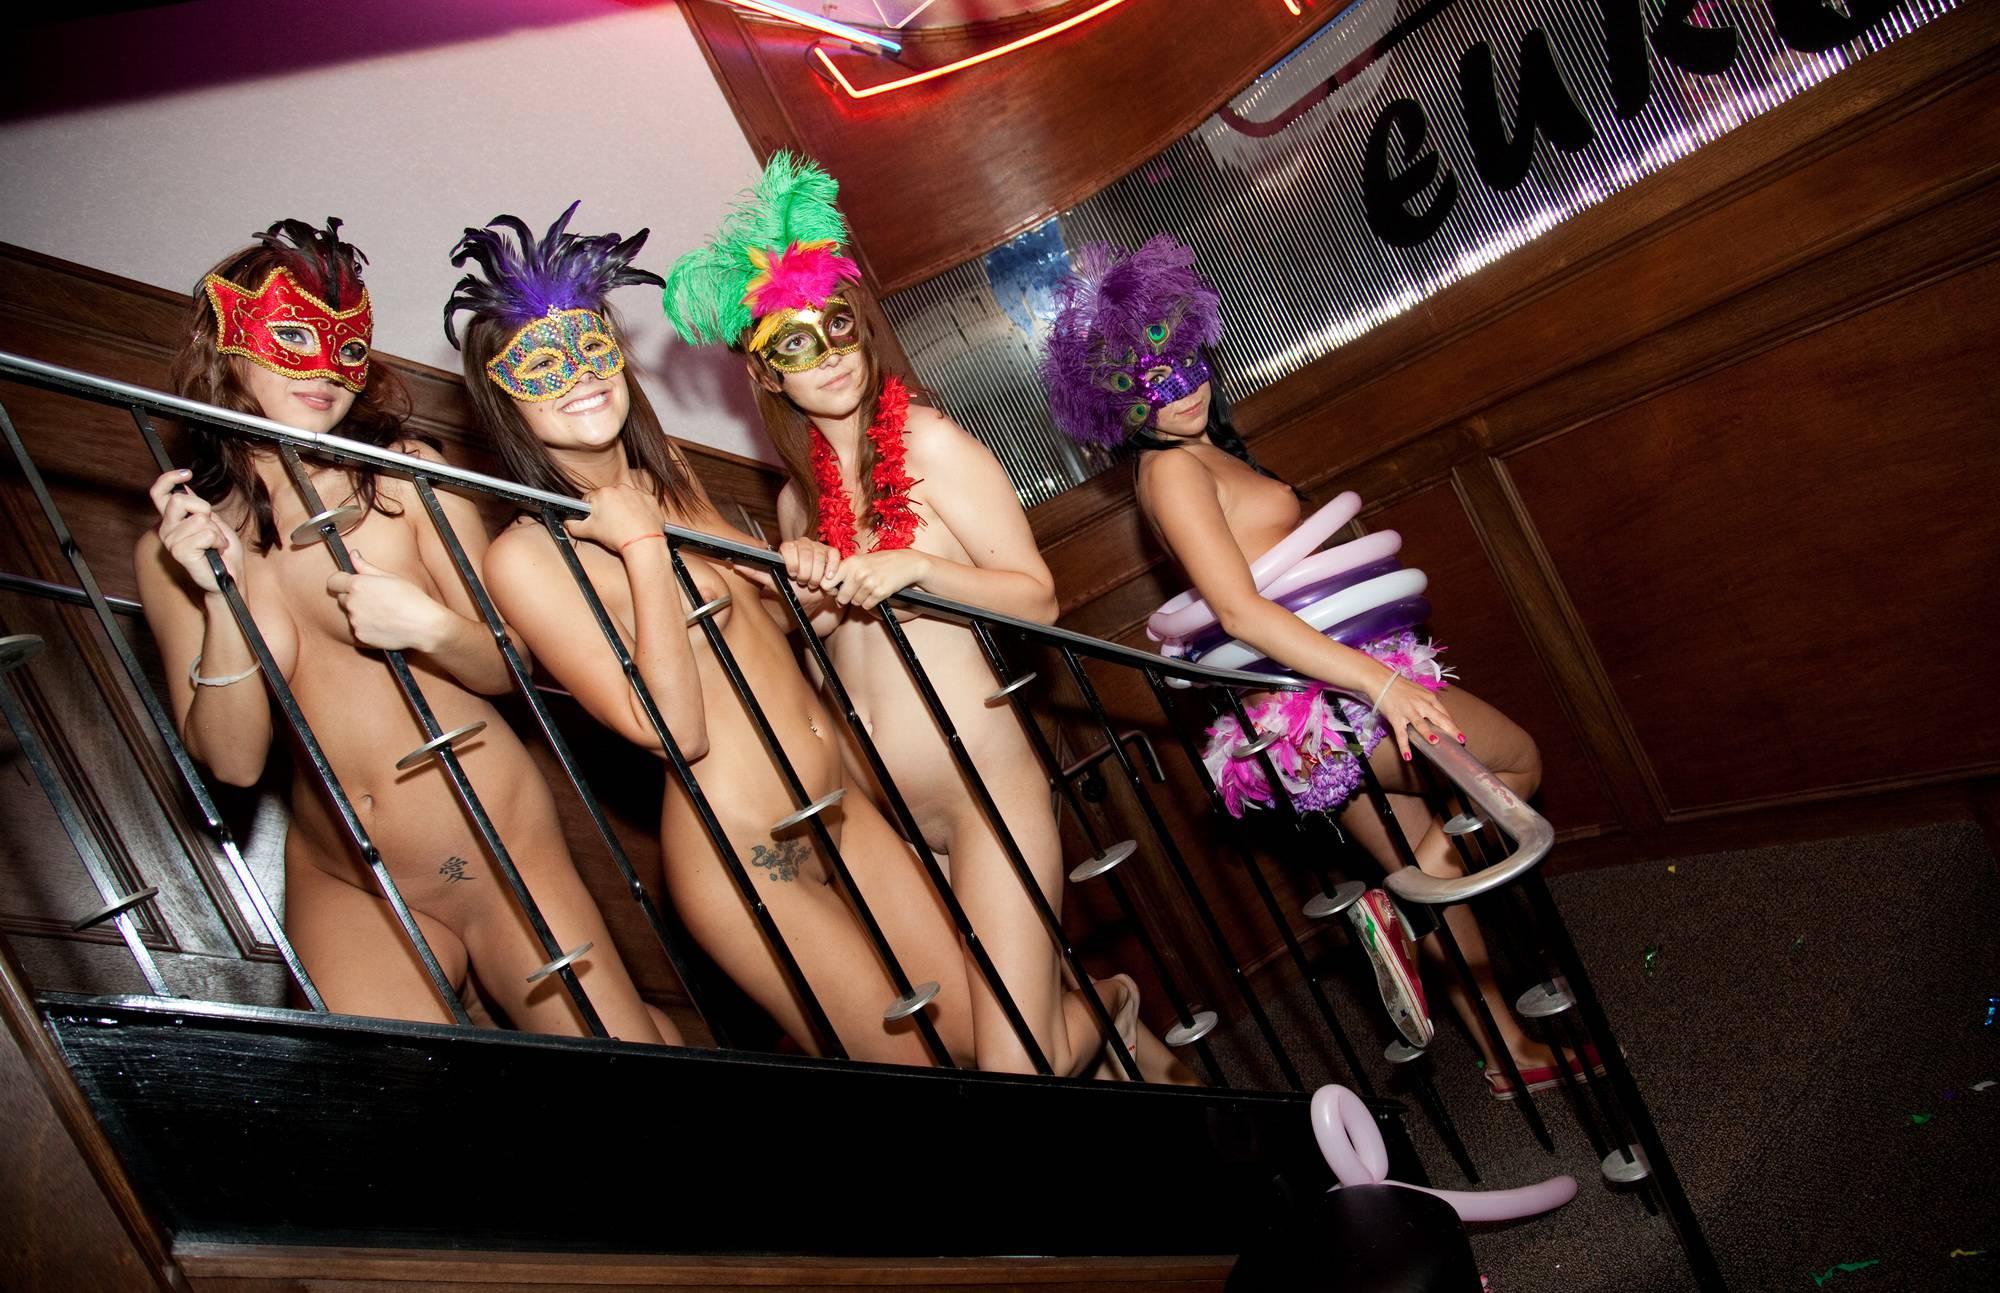 Purenudism Gallery-Masquerade Stairs Galore - 4